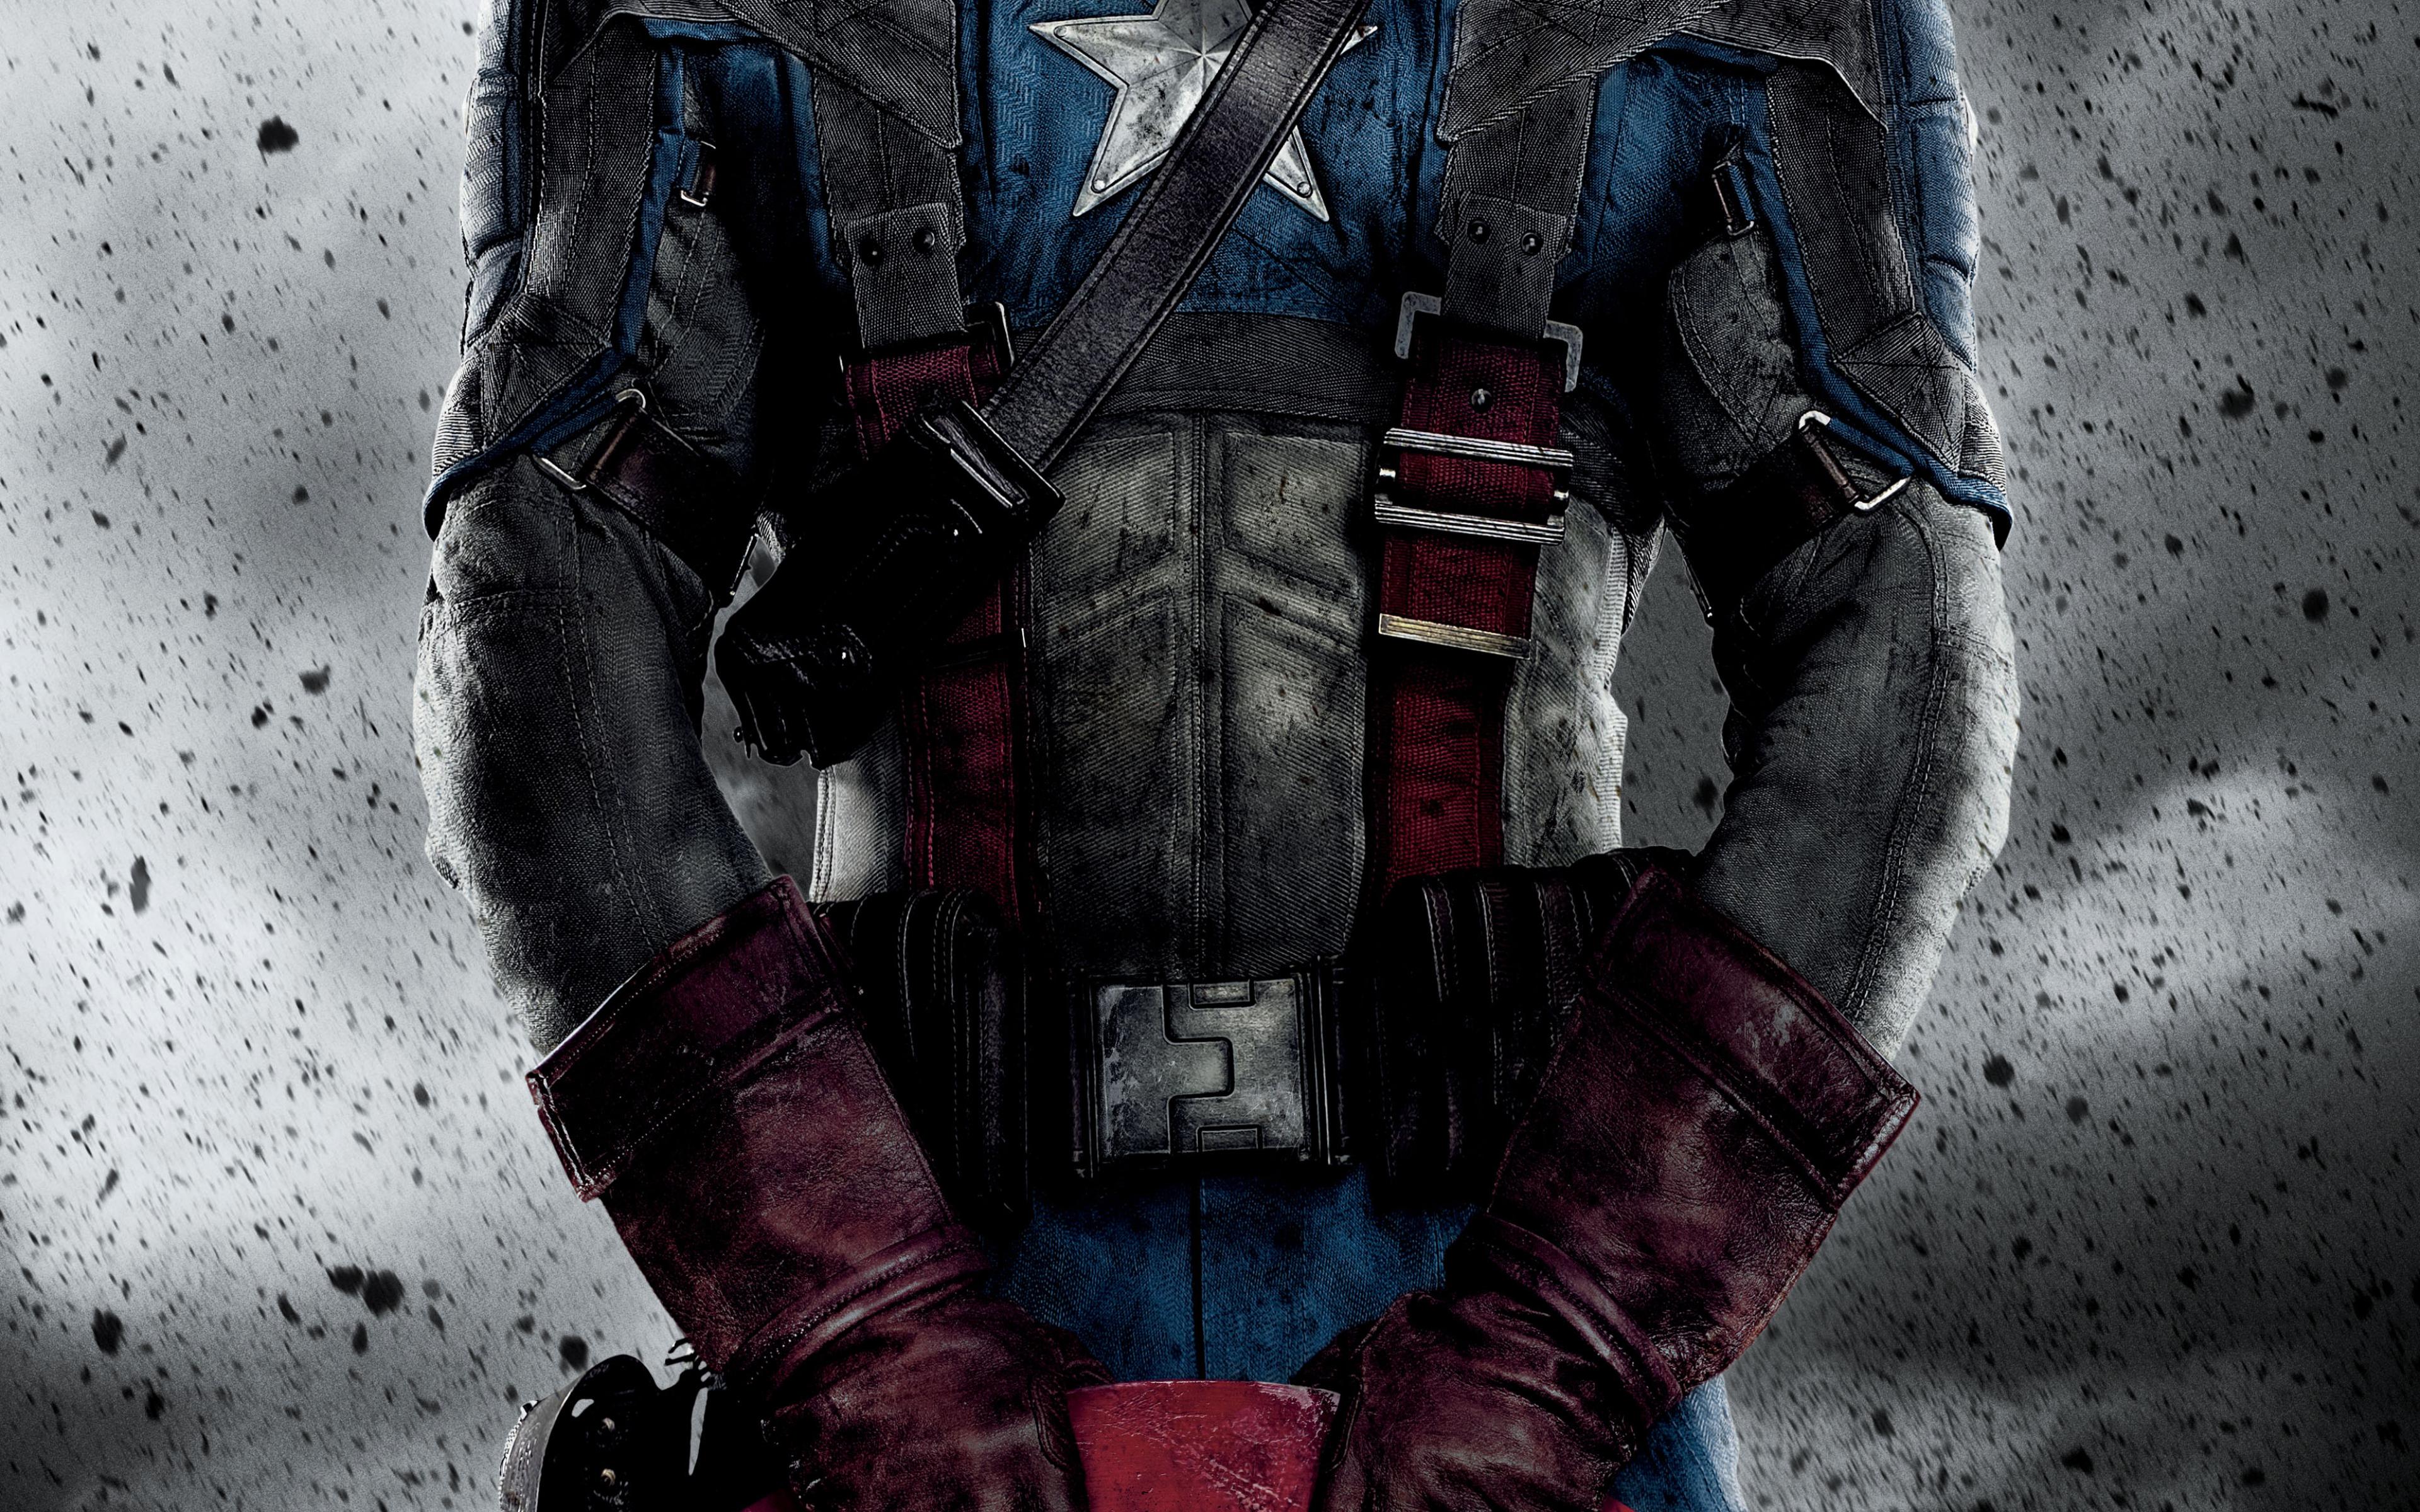 Captain America Photoshoot, HD 4K Wallpaper